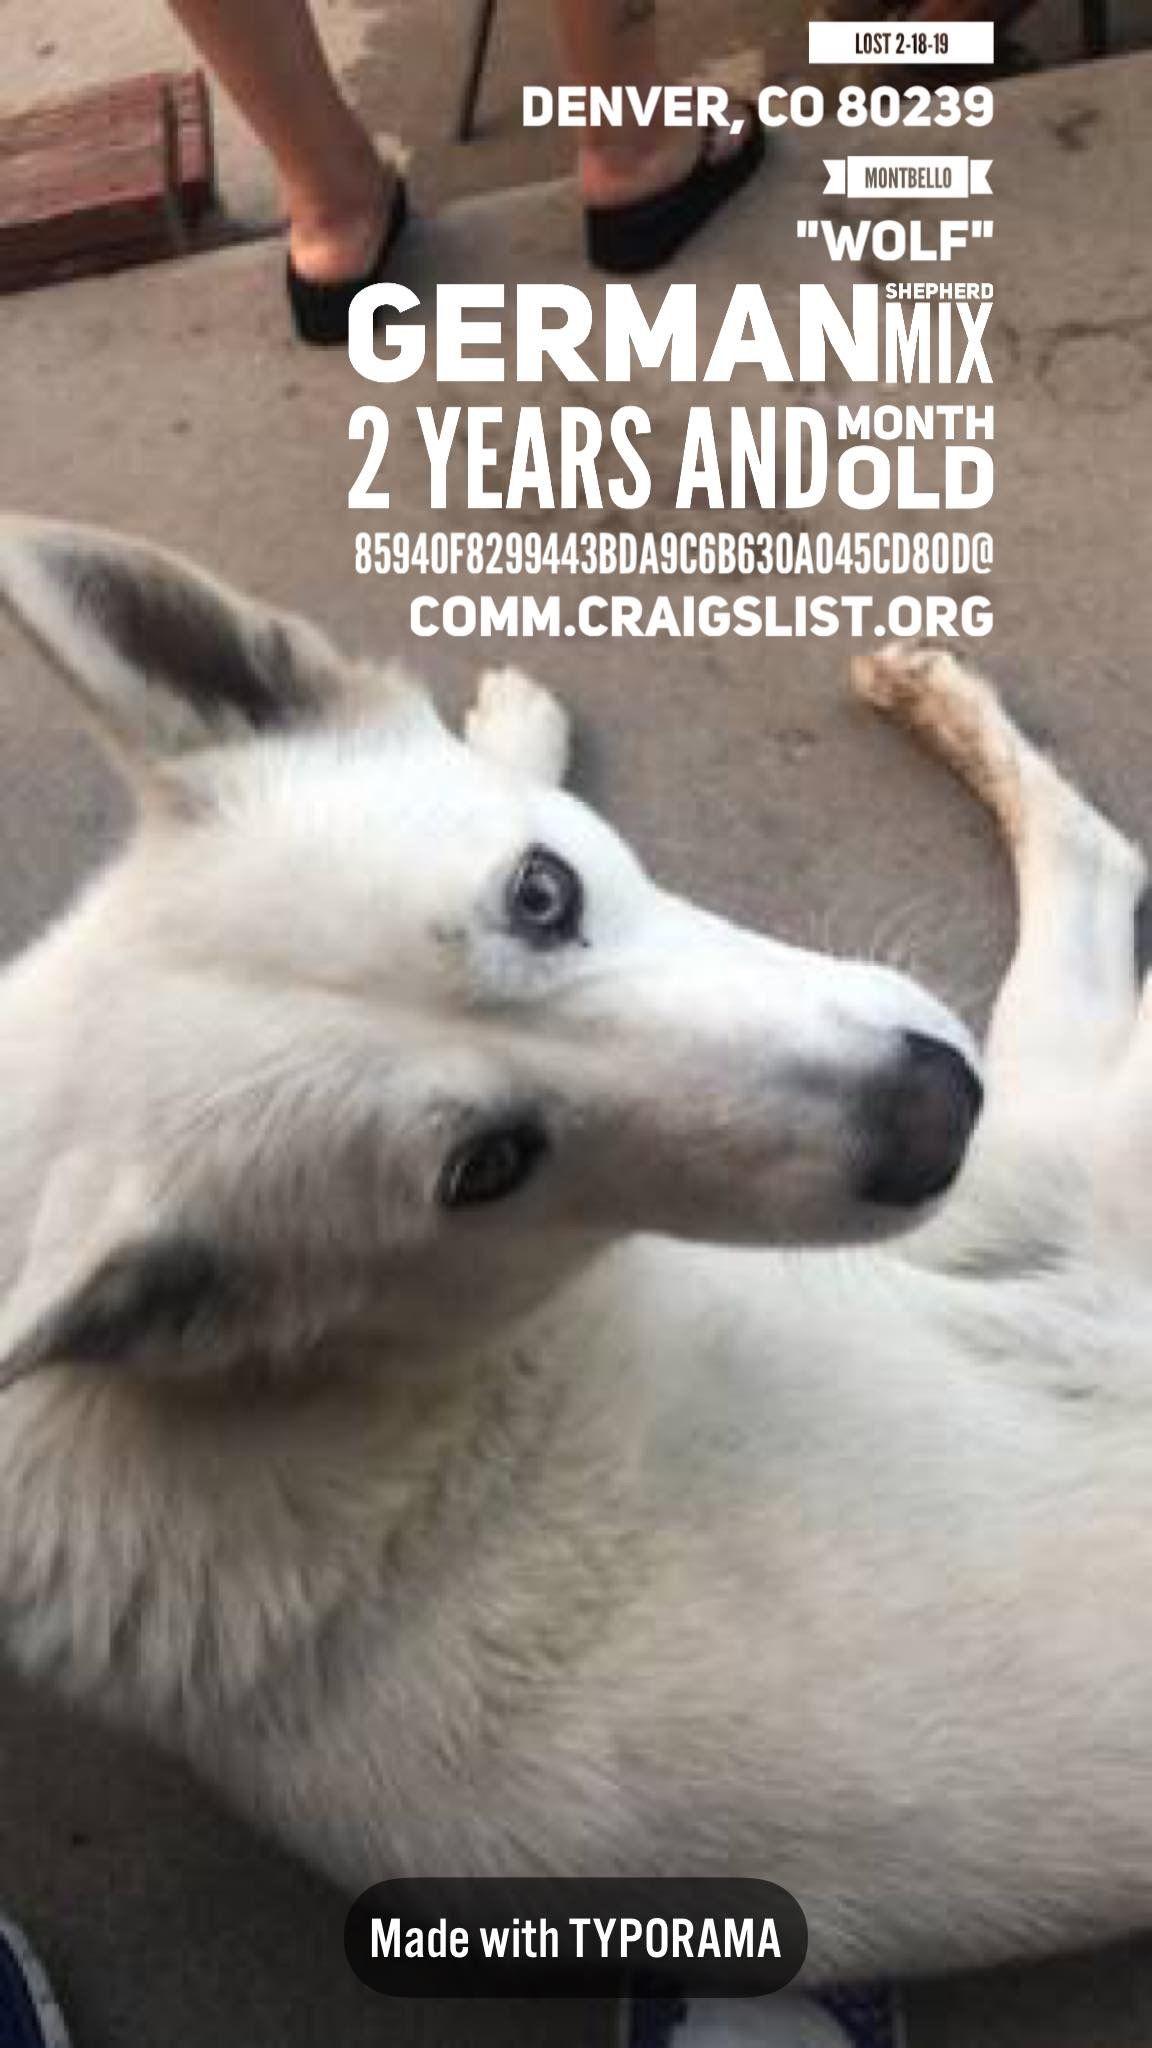 LOSTdog 2-18-19 #Denver, #CO 80239 Montbello